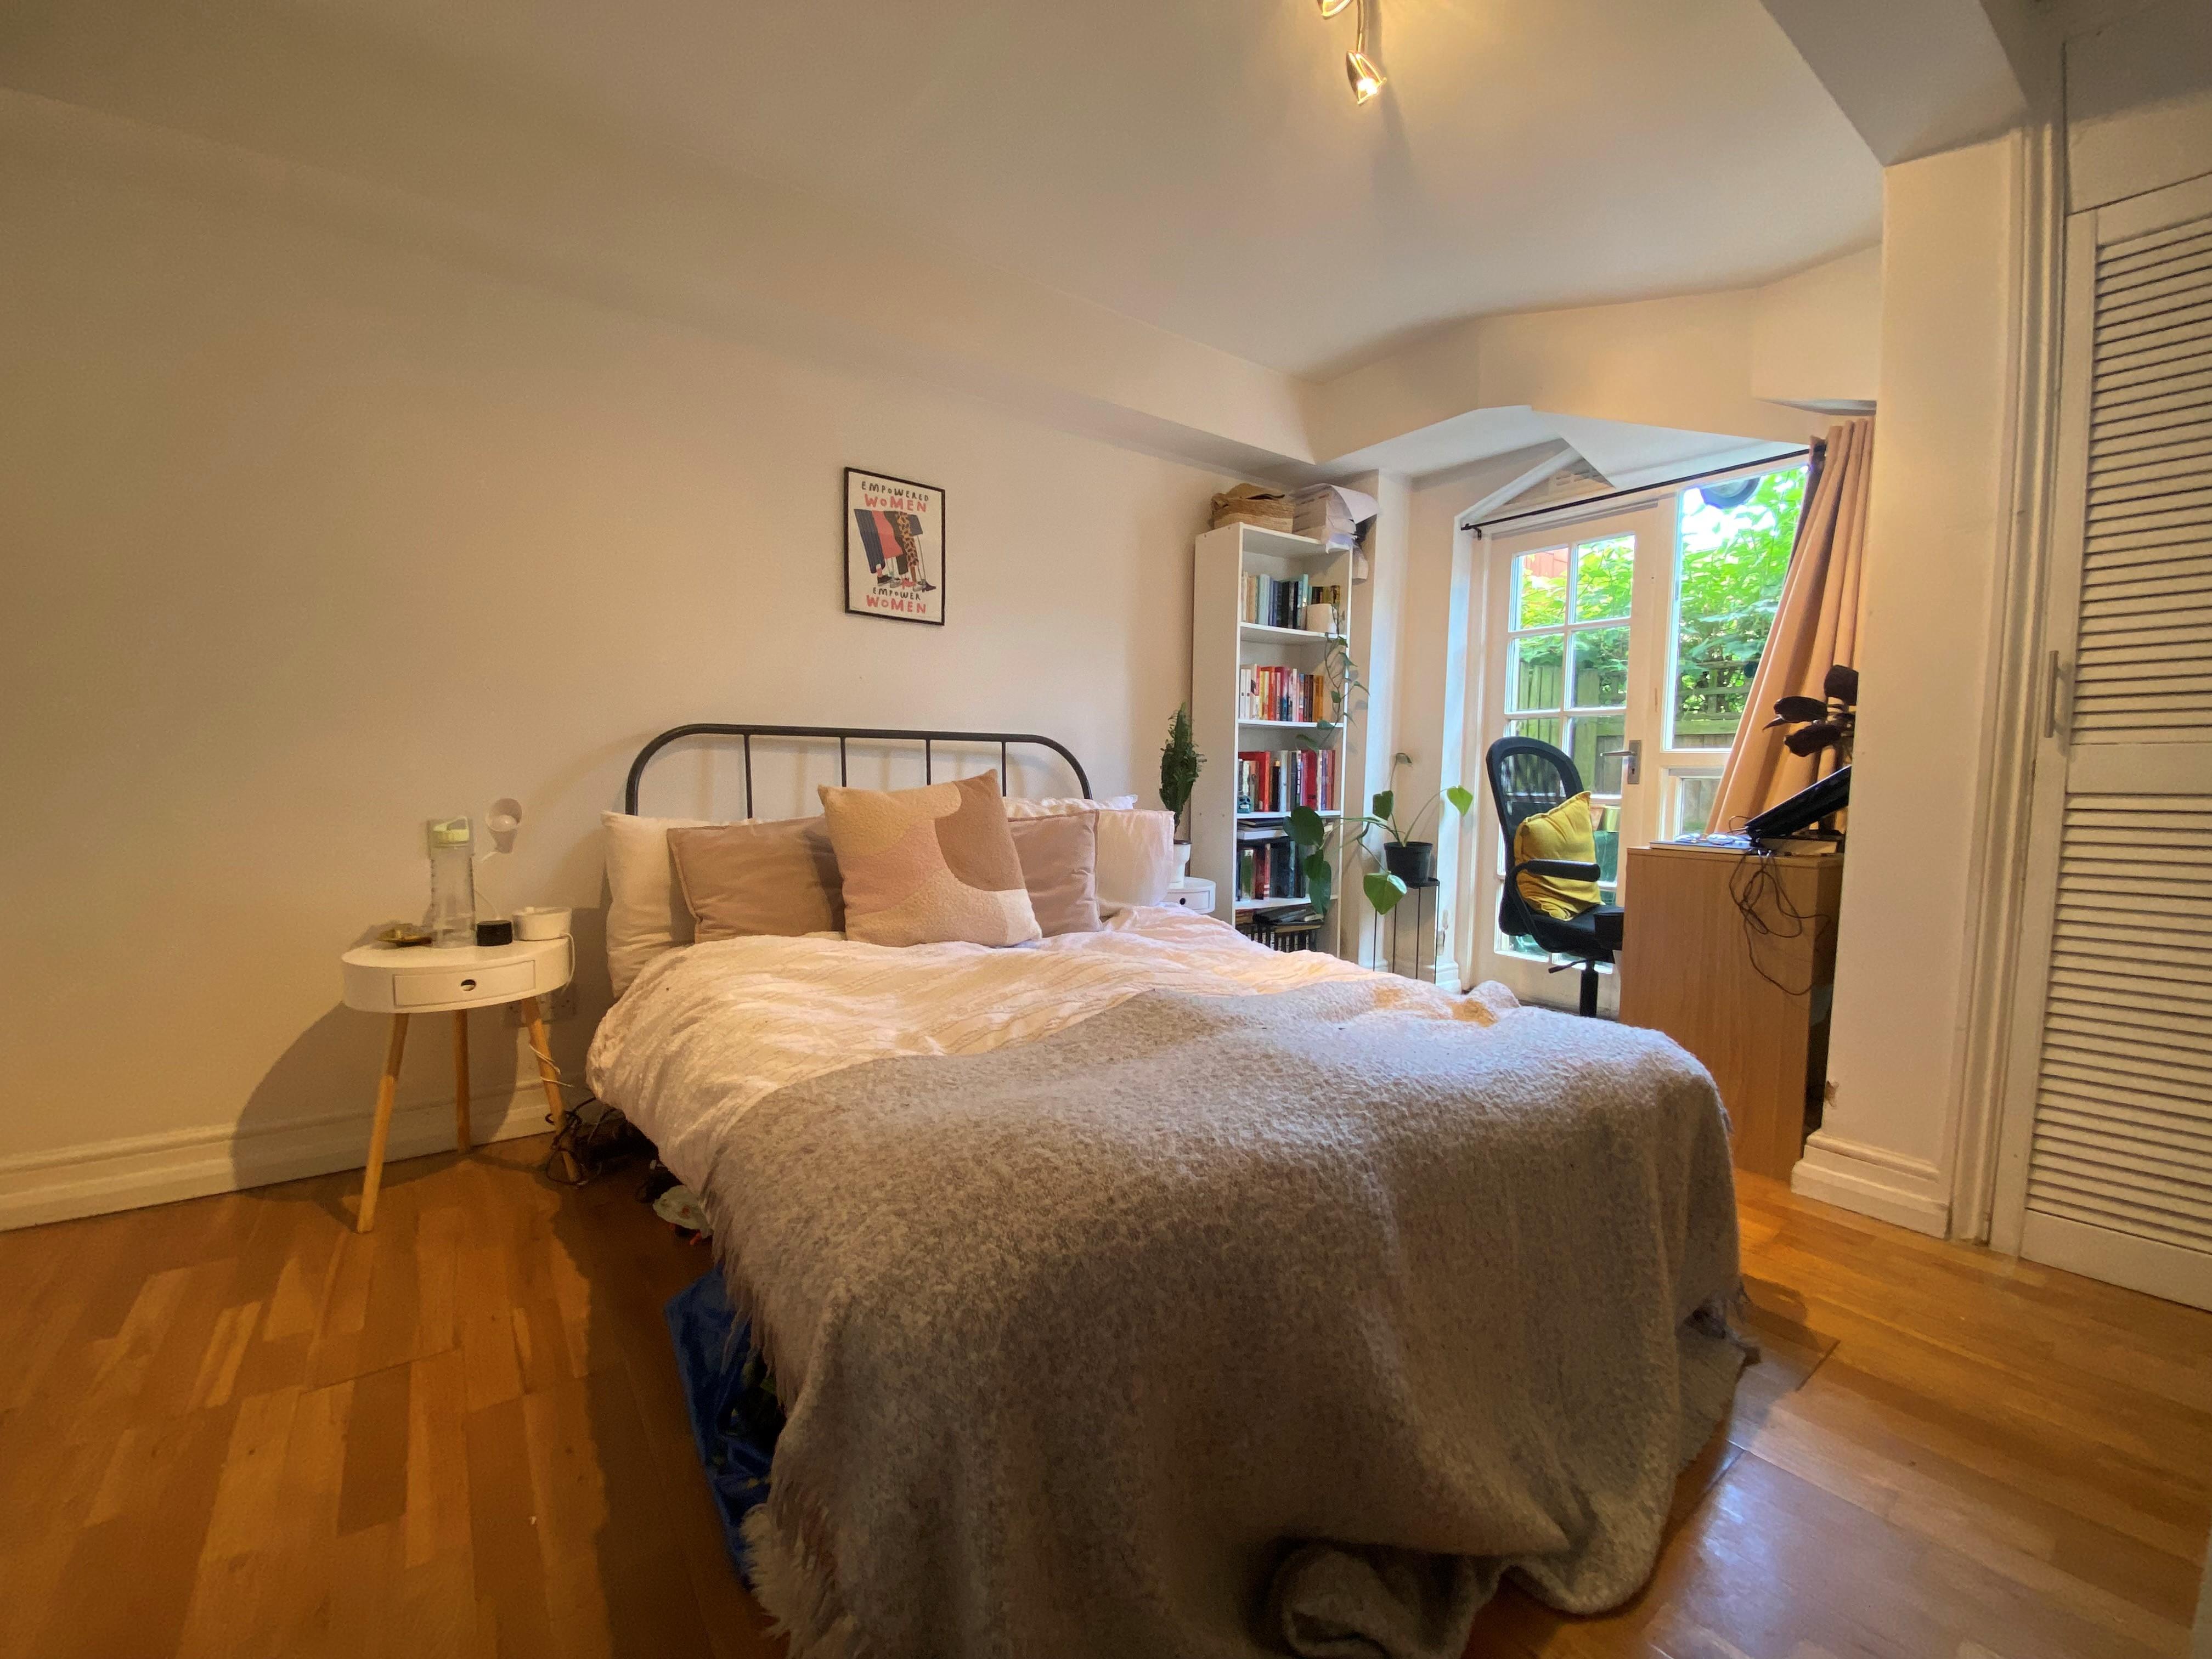 customer_1/branch_1/client_46460/sale_property/bedroom_1629464456.jpeg